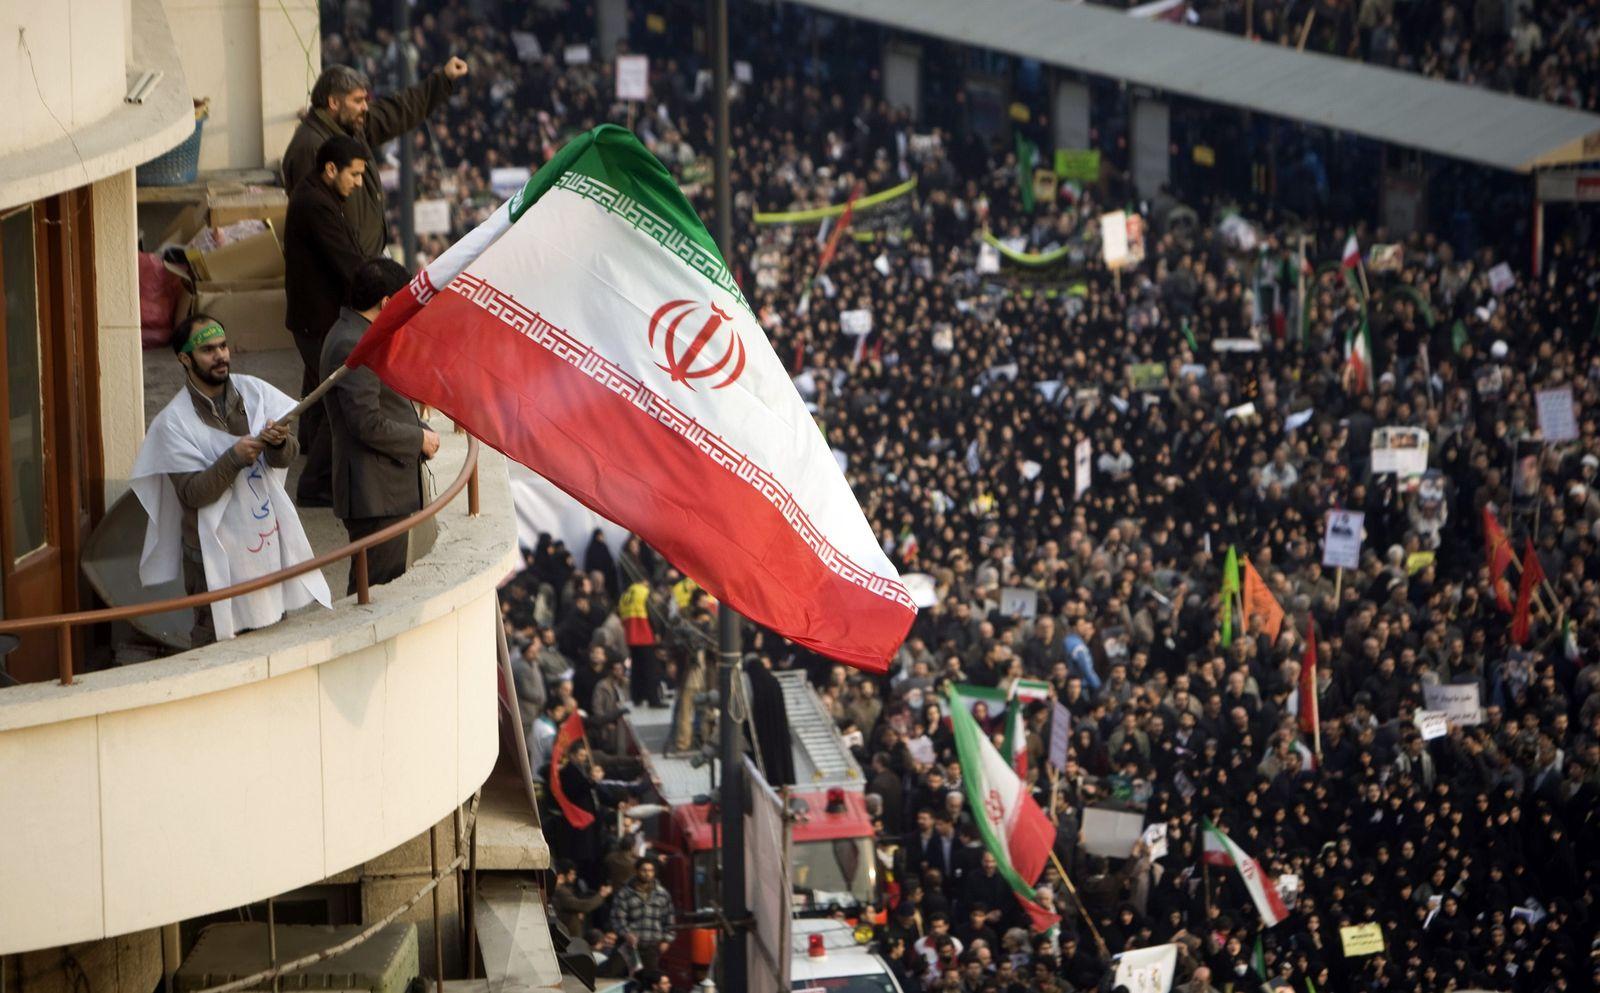 IRAN-RALLIES/